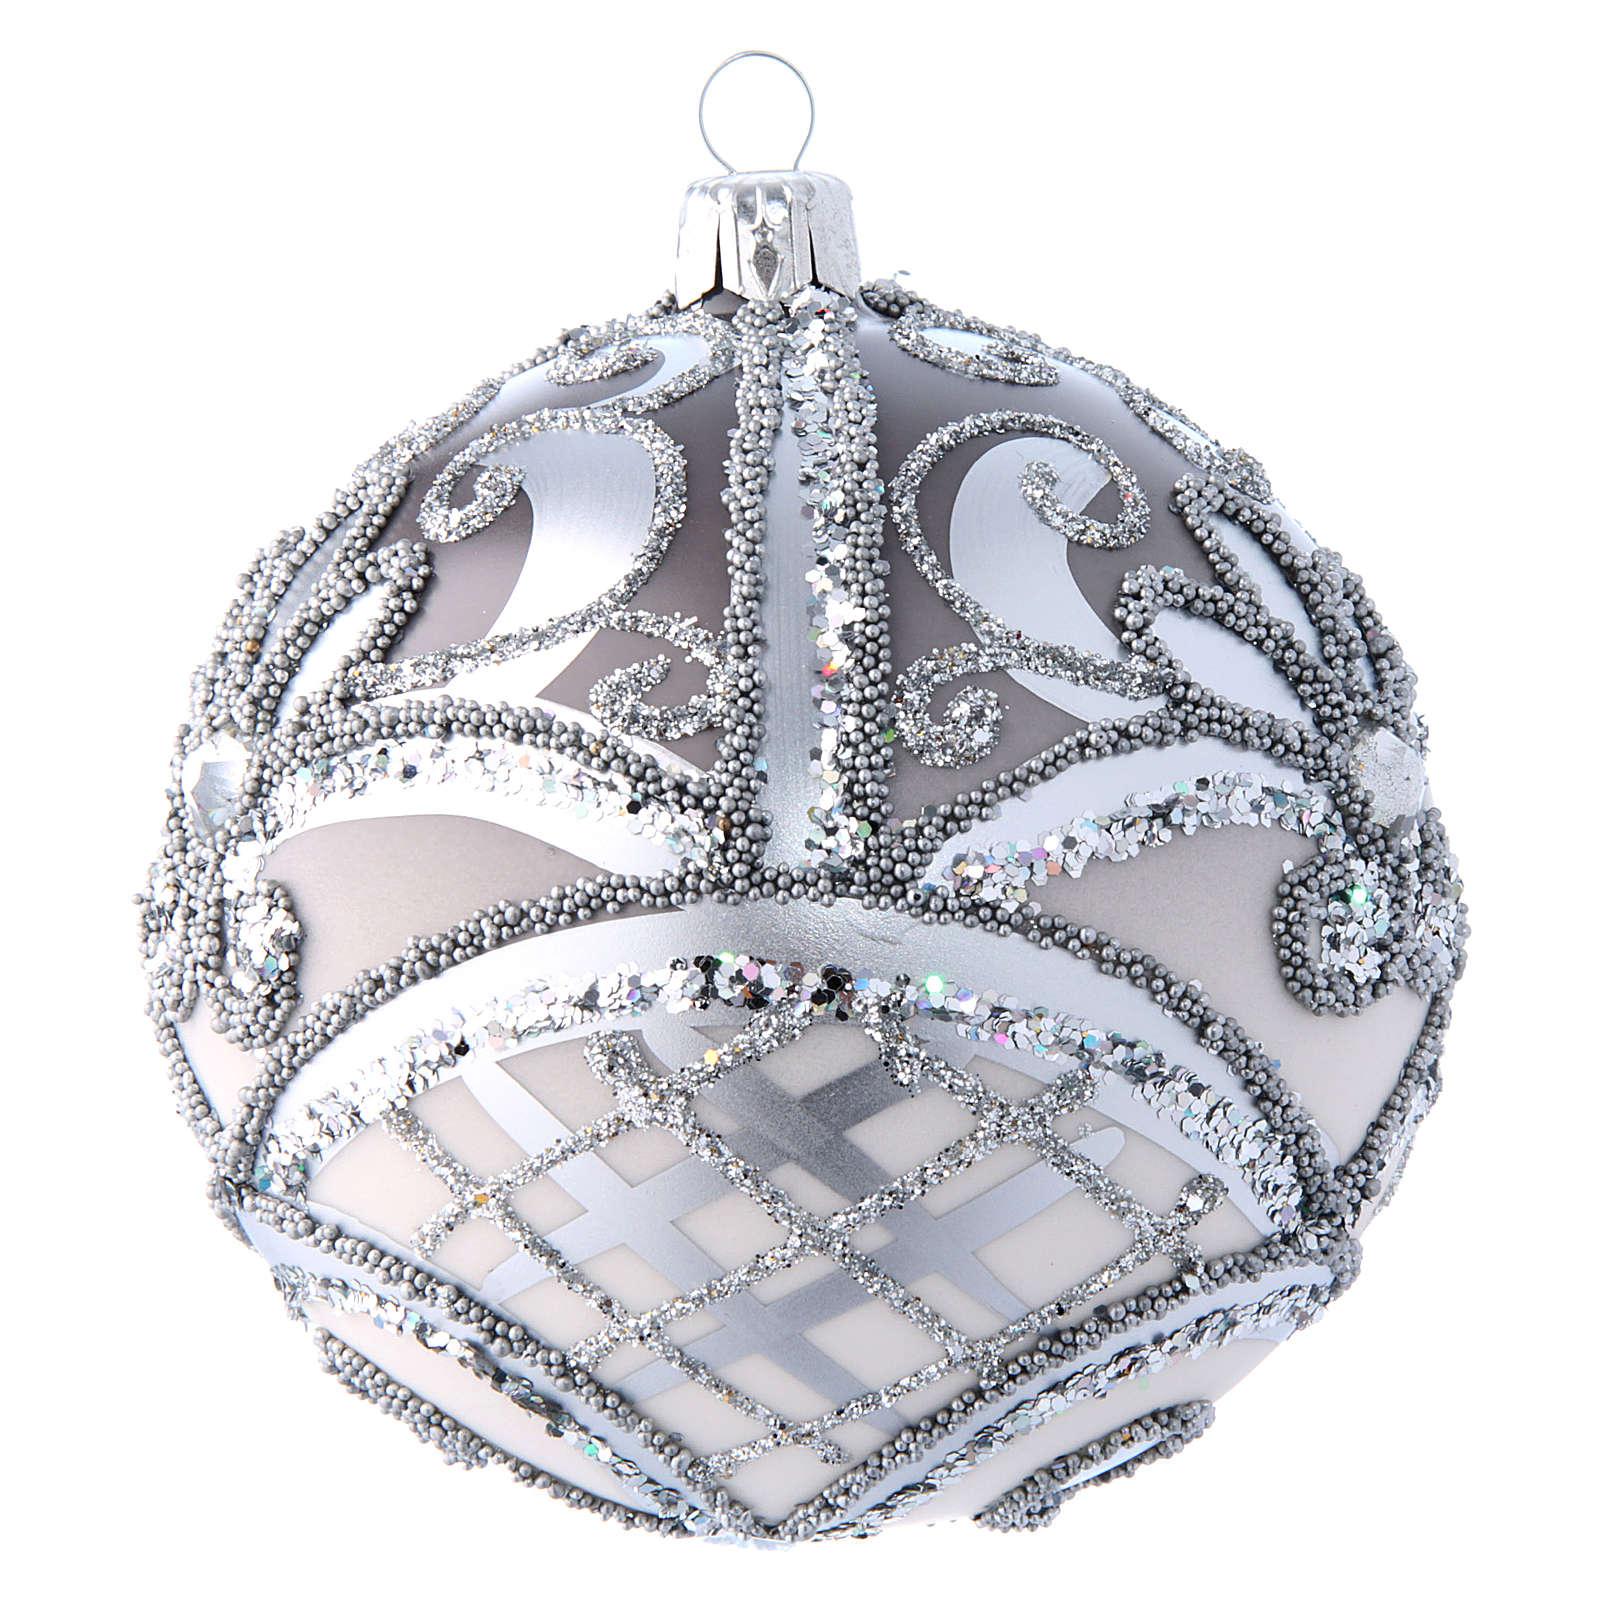 Pallina Albero Natale argento 100 mm vetro soffiato 4